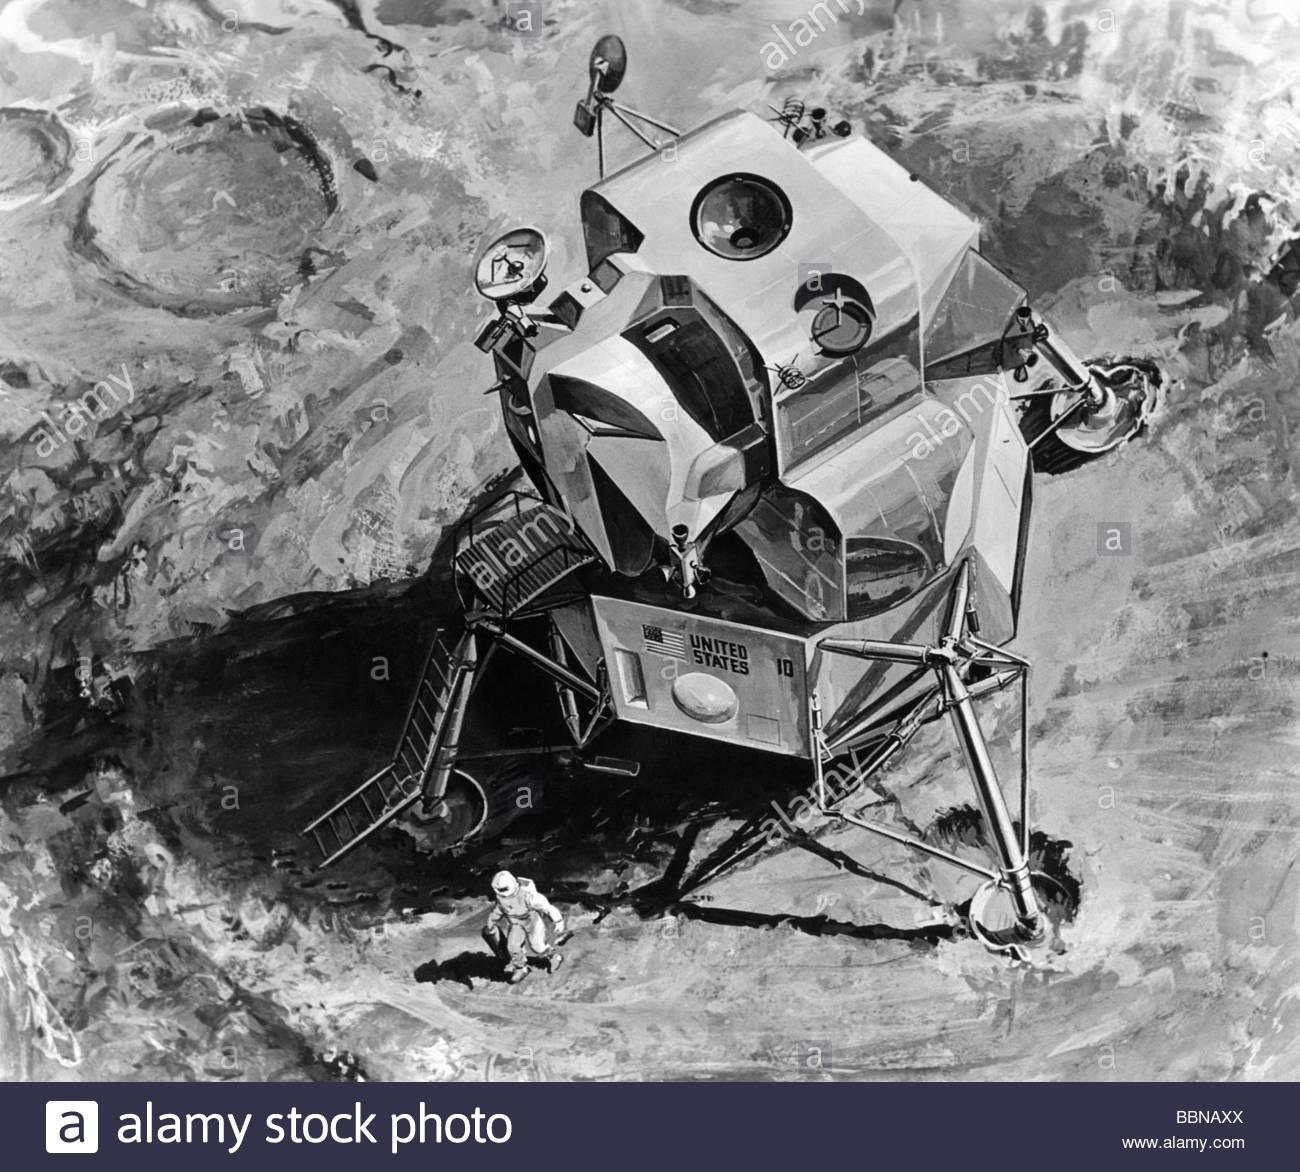 drawing apollo 11 moon lander - photo #2